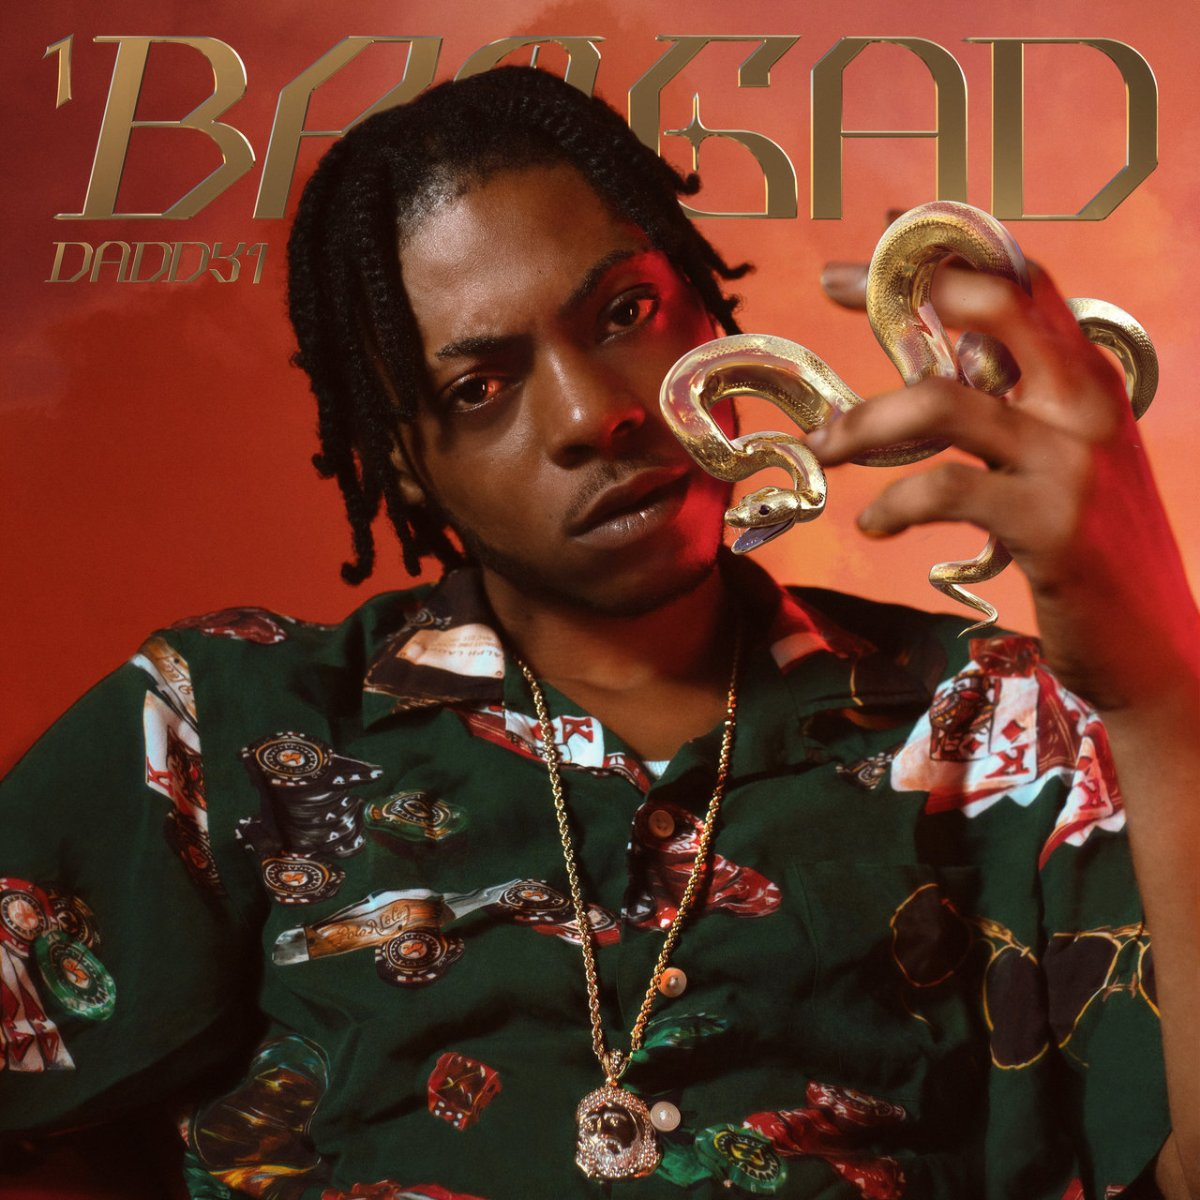 Daddy1 - 1 Bro Gad (Cover)